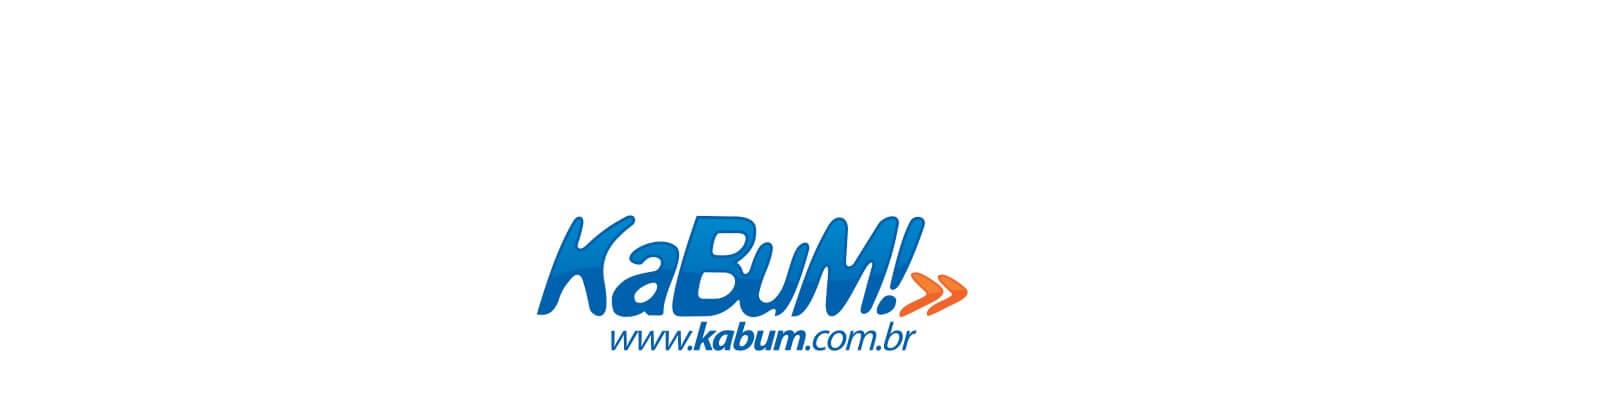 "KaBuM é Confiável? Com certeza sim!<span class=""wtr-time-wrap after-title""><span class=""wtr-time-number"">6</span> minutos de leitura</span>"